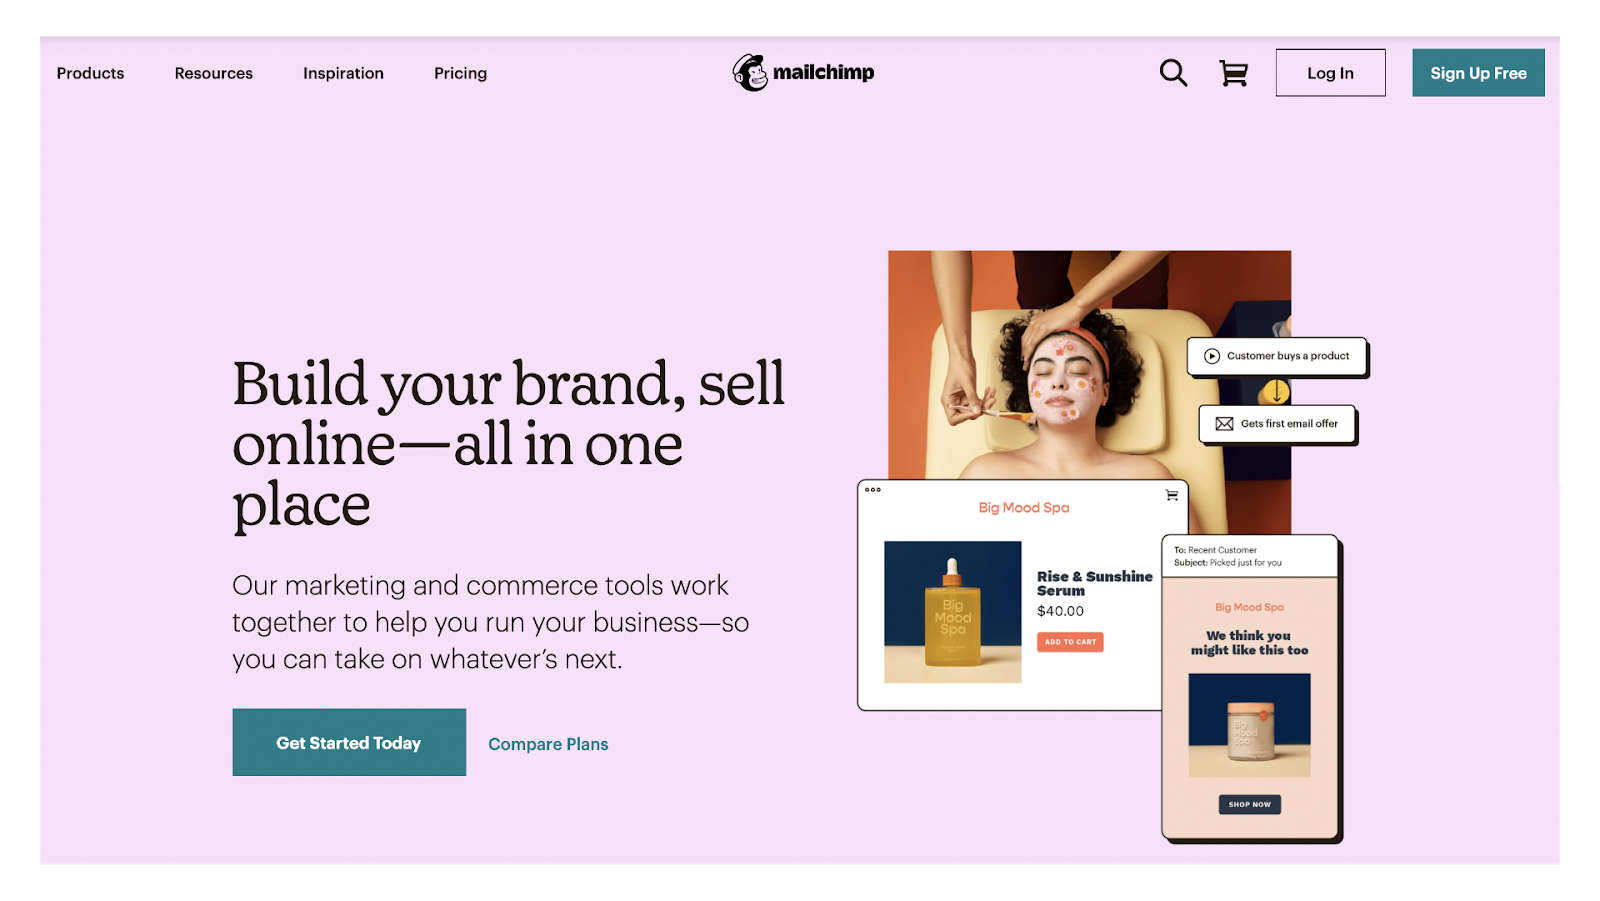 Mailchimp webpage